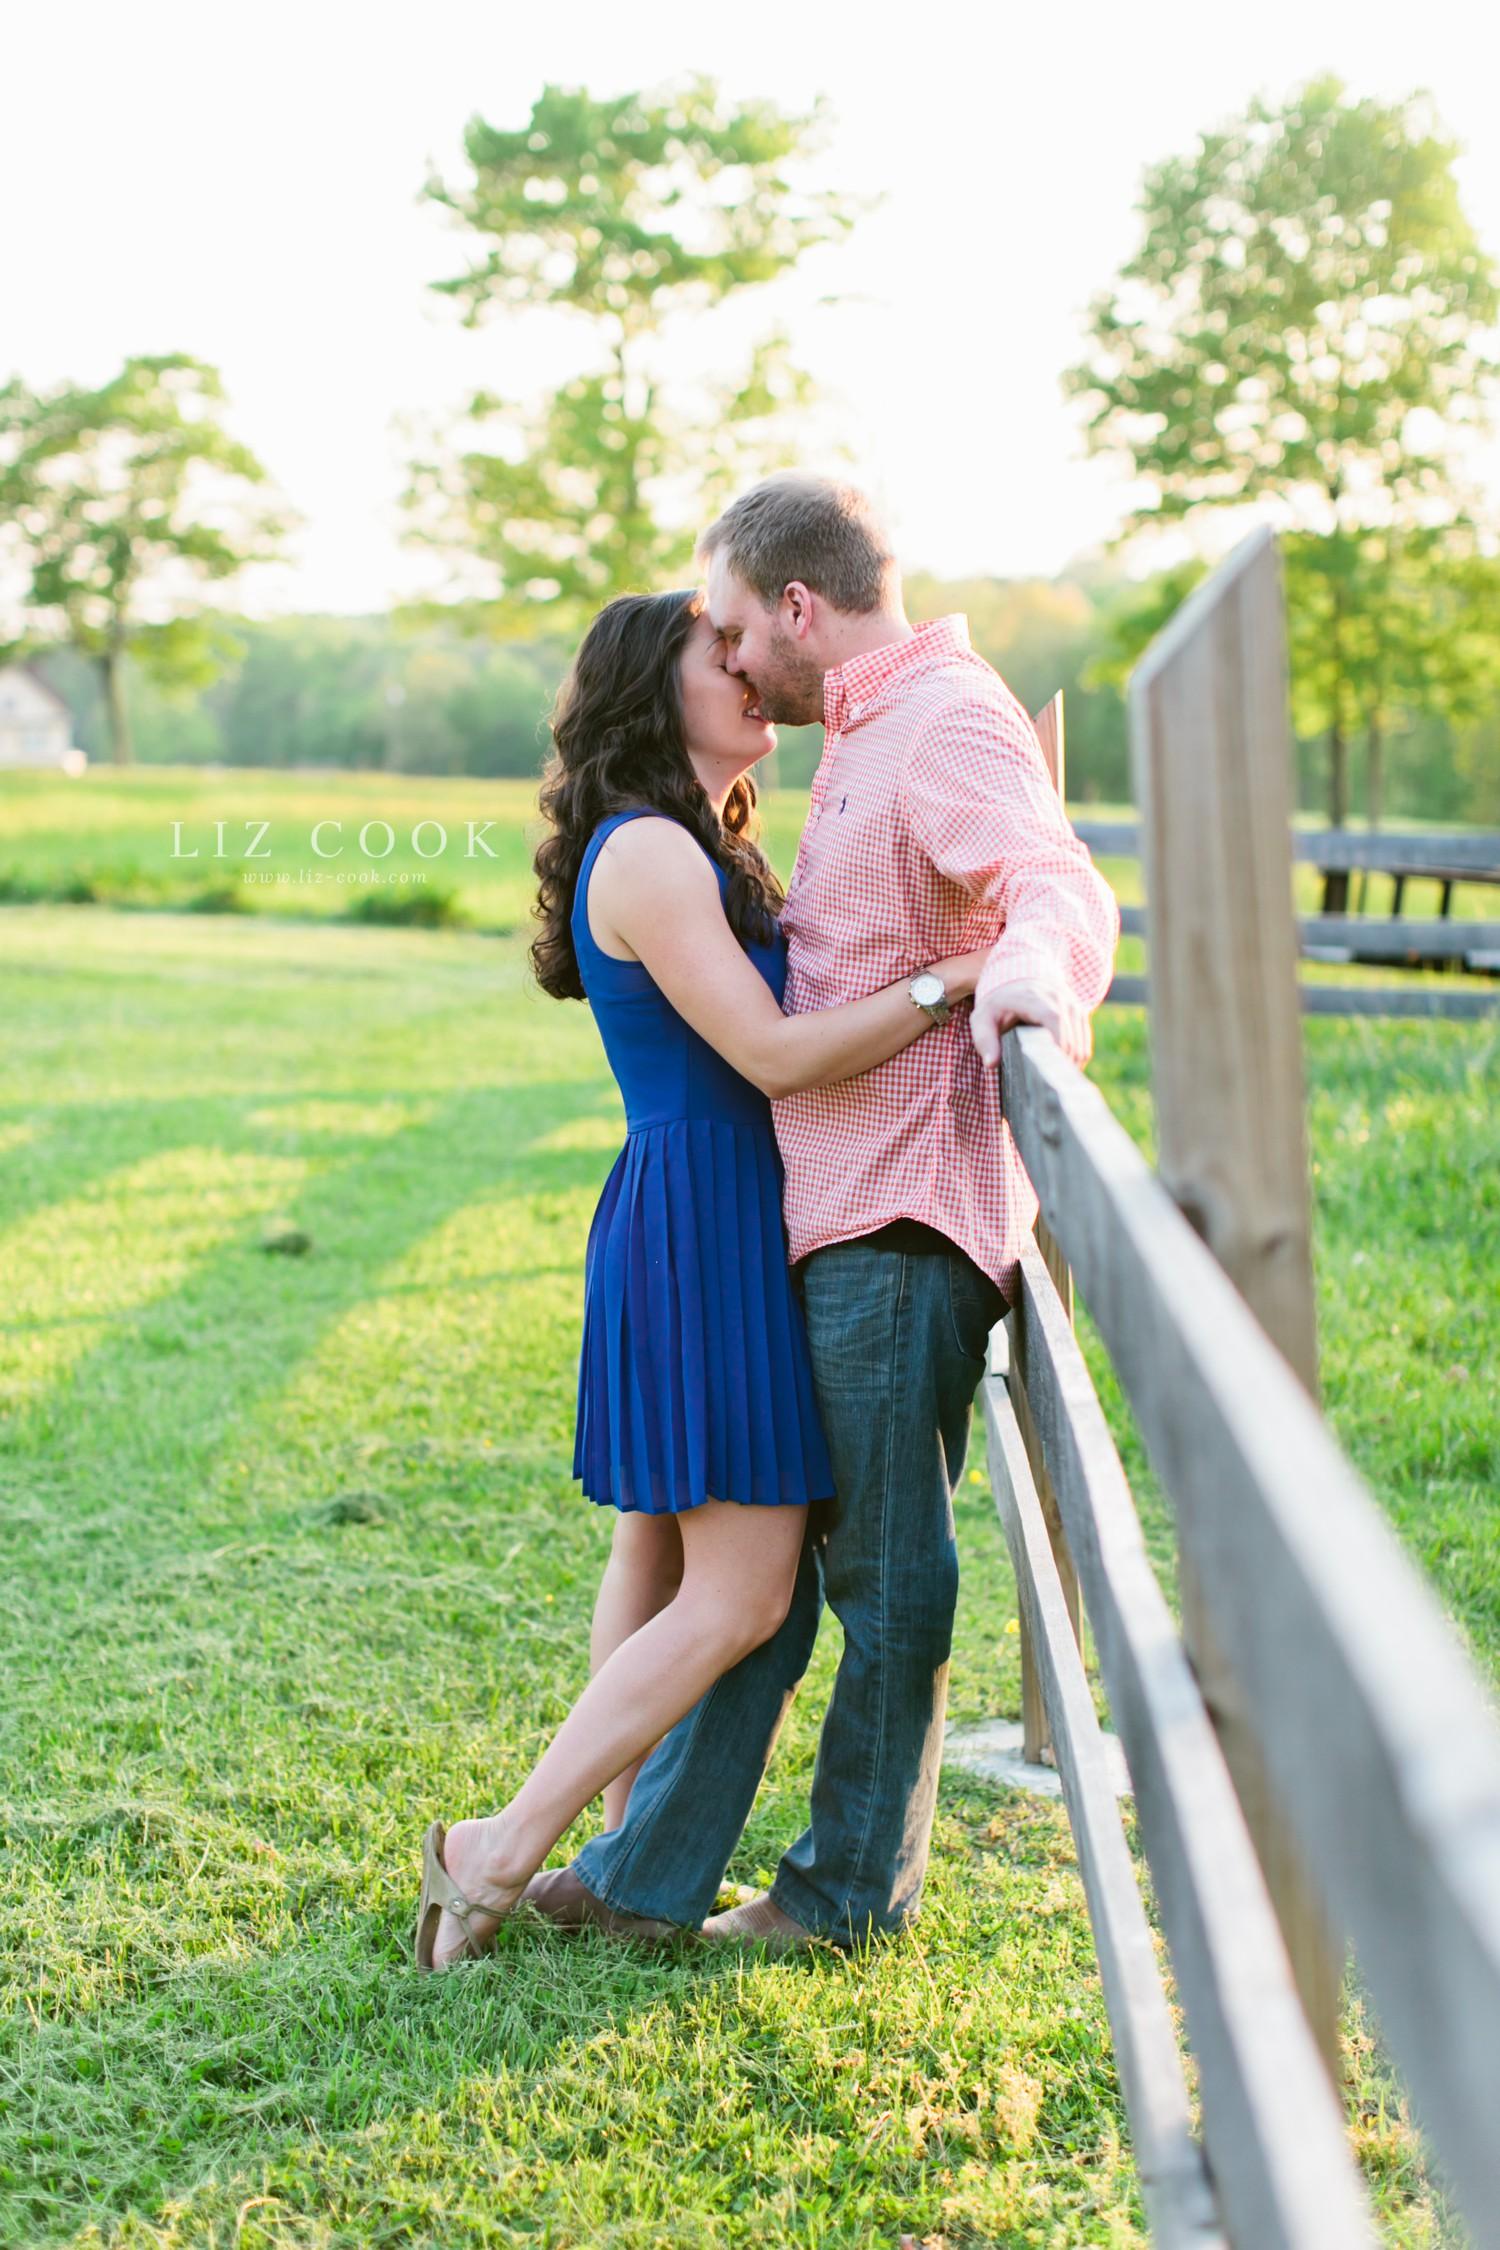 appomattox_lavender_farm_pictures_liz_cook_photography_0016.jpg